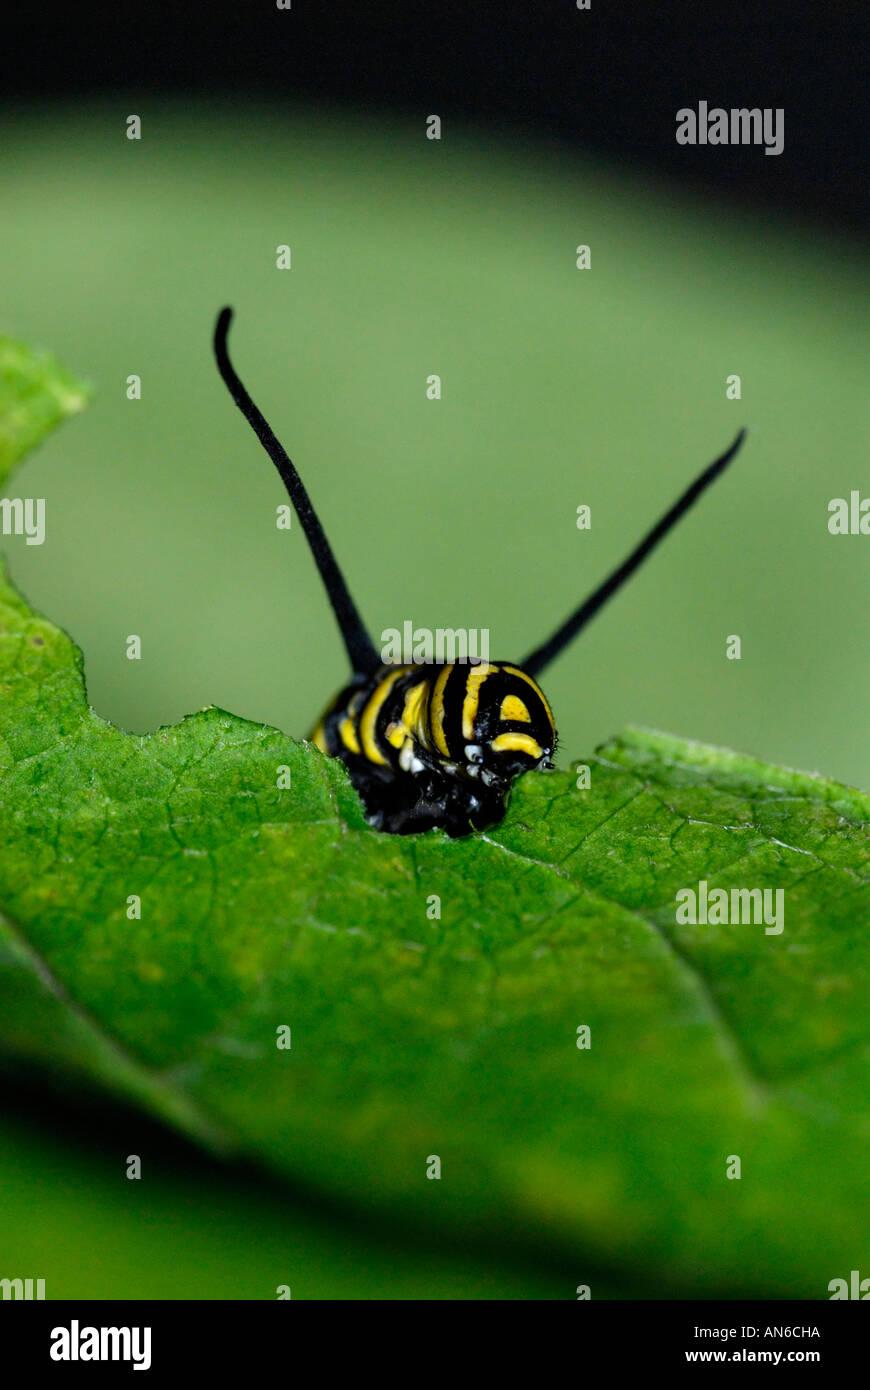 Monarch, Danaus plexippus, caterpillar eating a milkweed, Asclepias sp., leaf - Stock Image